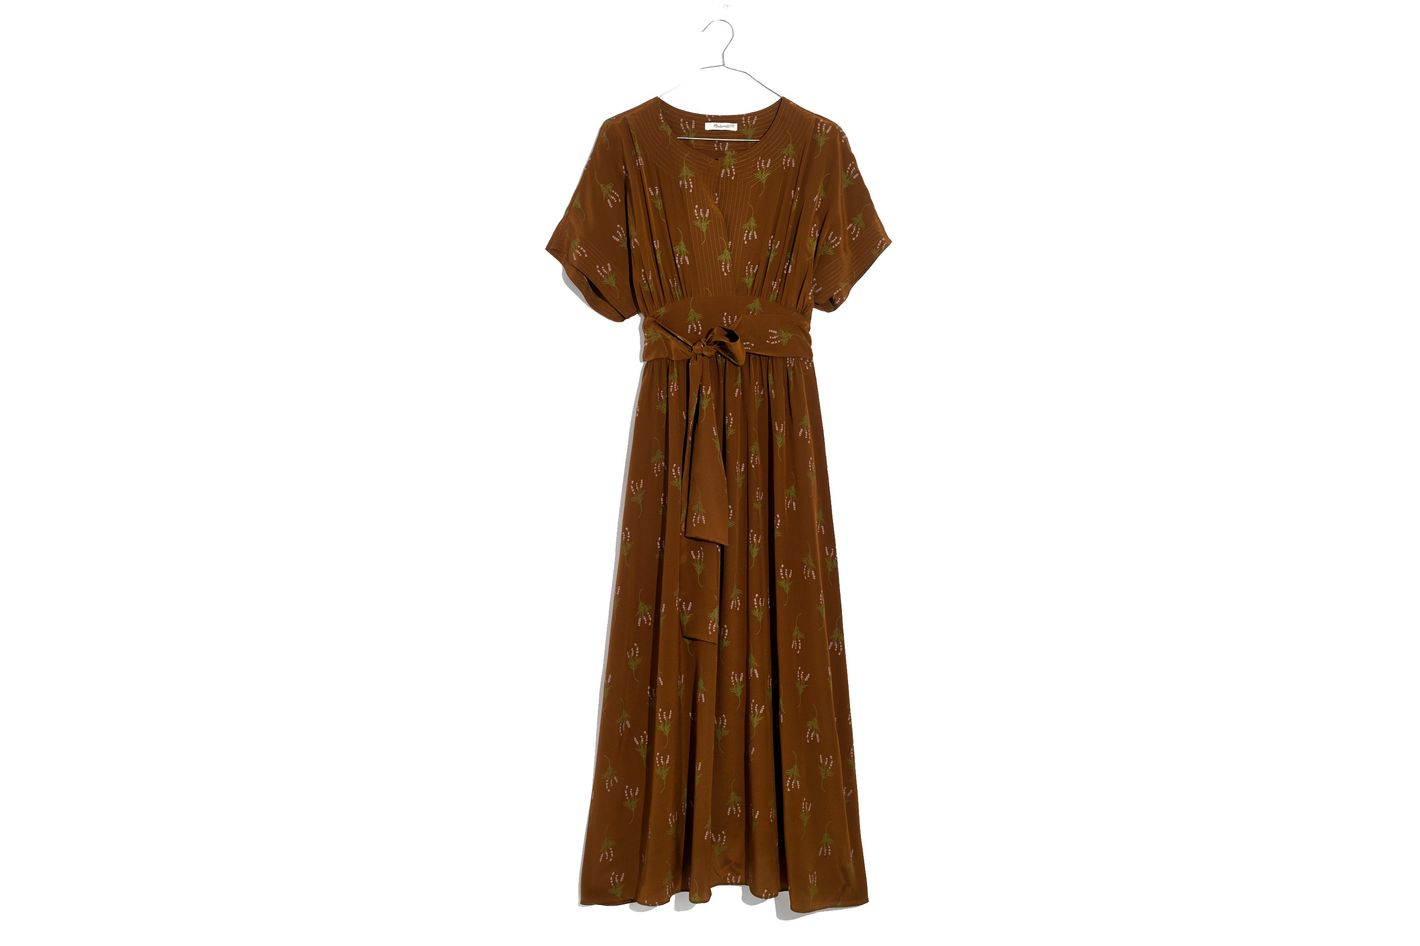 Madewell x No.6 Silk Kimono Dress